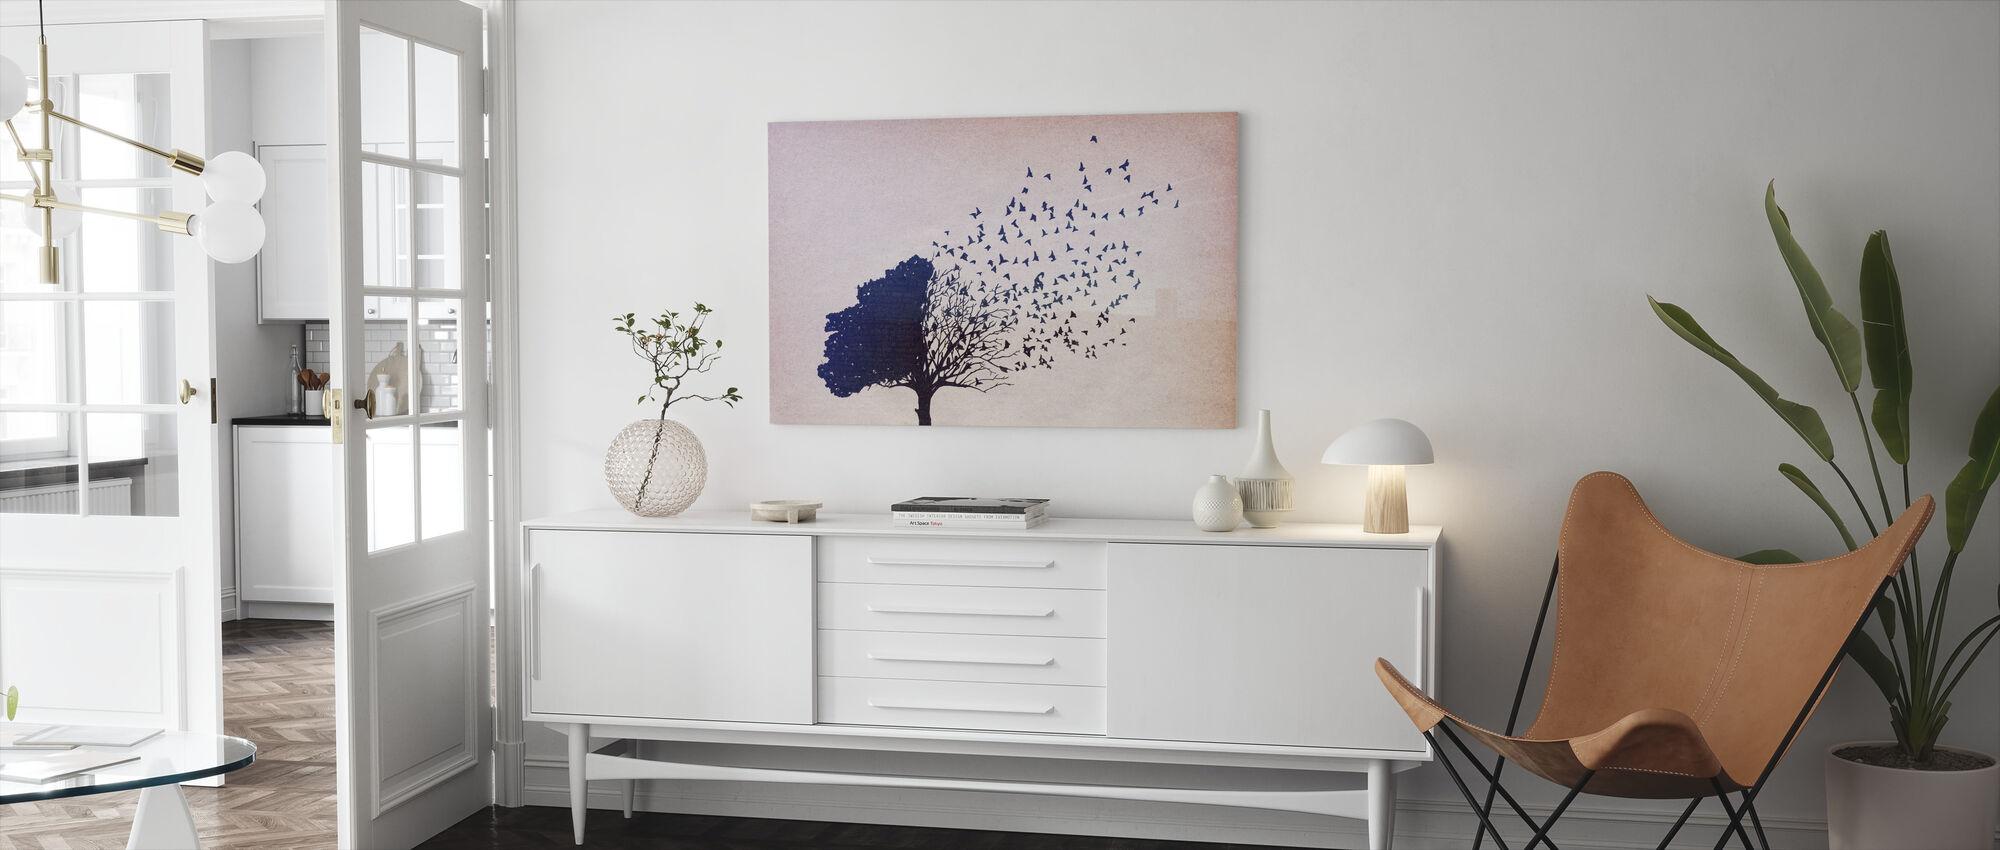 Linnut Lehdet - Canvastaulu - Olohuone